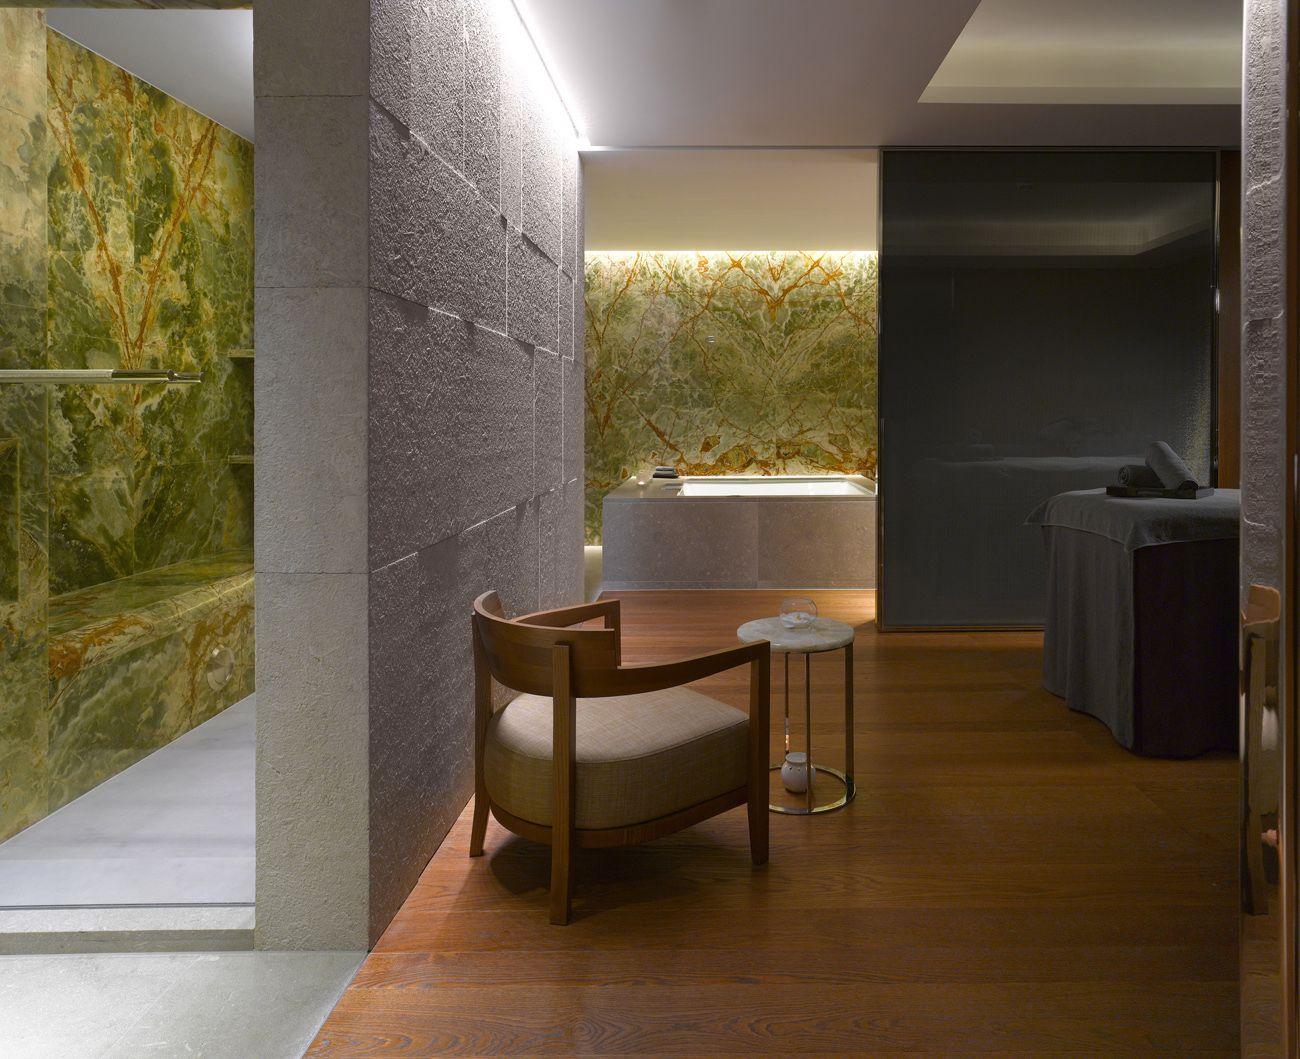 Spa hotel in london with wellness center bulgari hotel resort